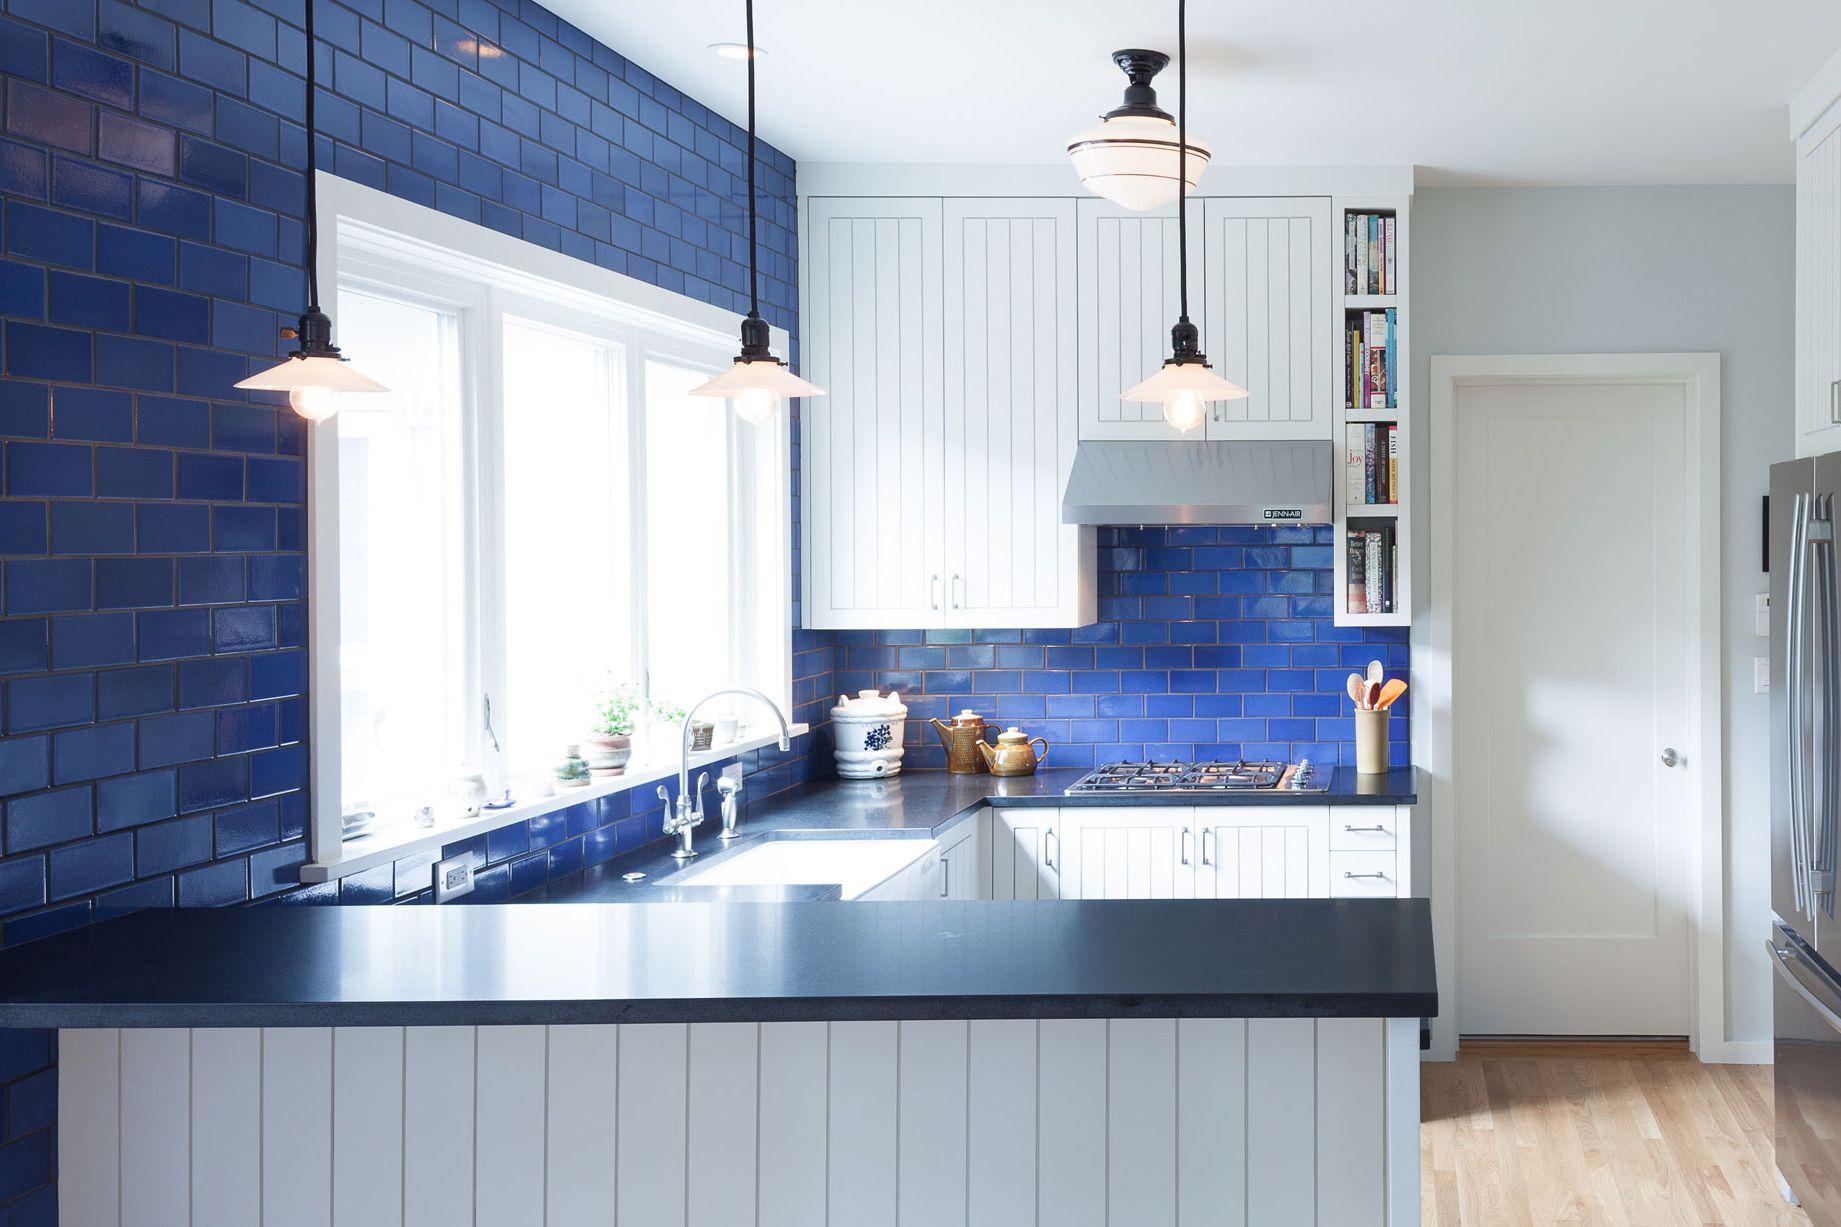 Uncategorized Blue Kitchen Design 29 beautiful blue kitchen design ideas